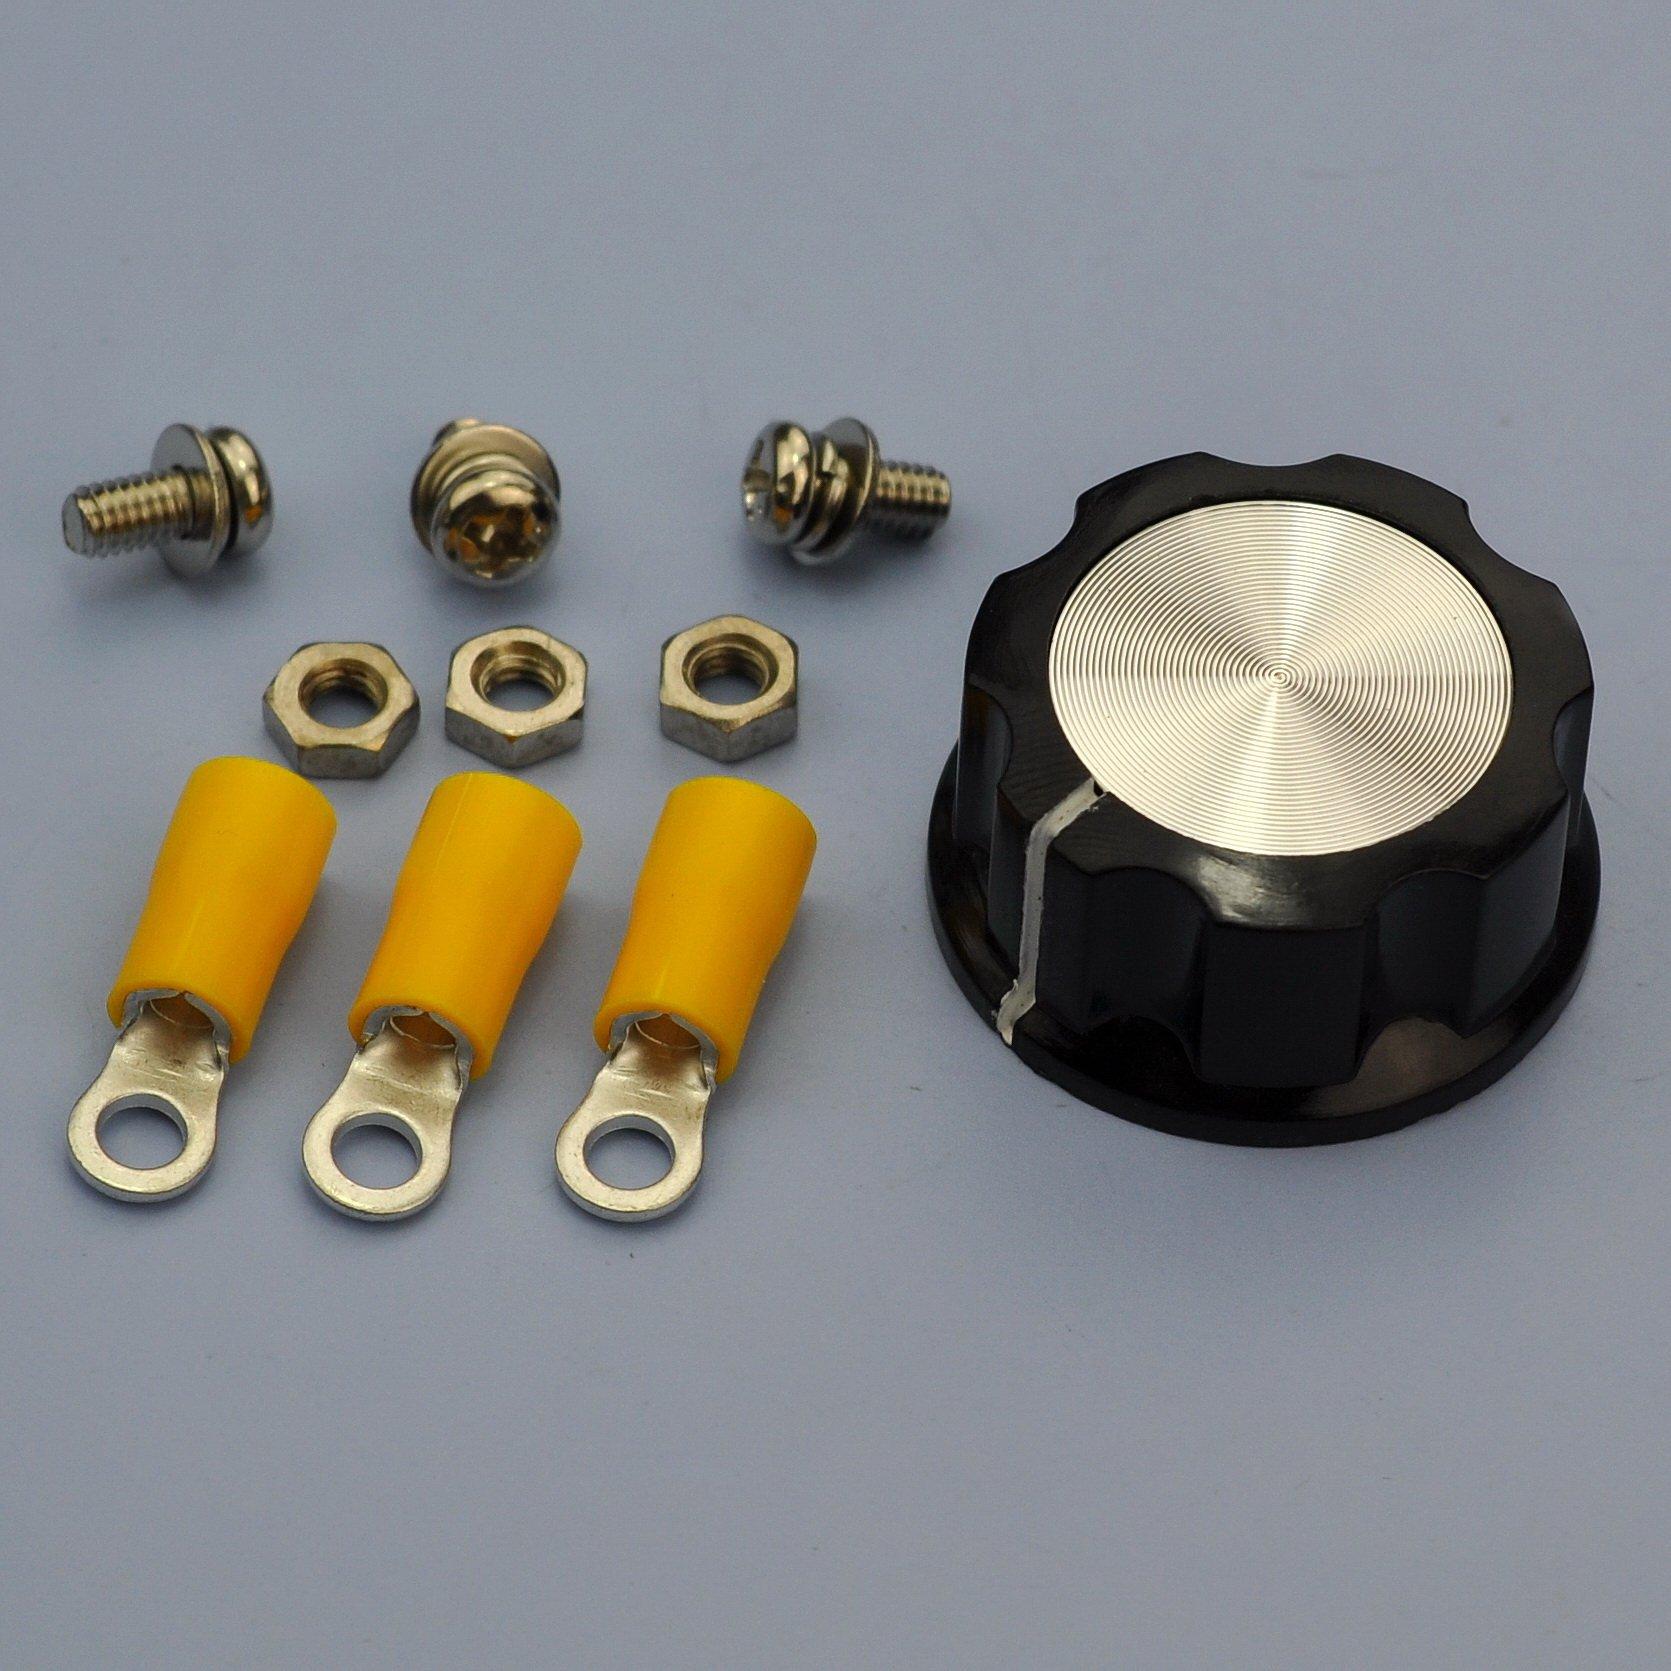 Electronics-Salon 100W 50 OHM High Power Wirewound Potentiometer, Rheostat, Variable Resistor. by Electronics-Salon (Image #6)